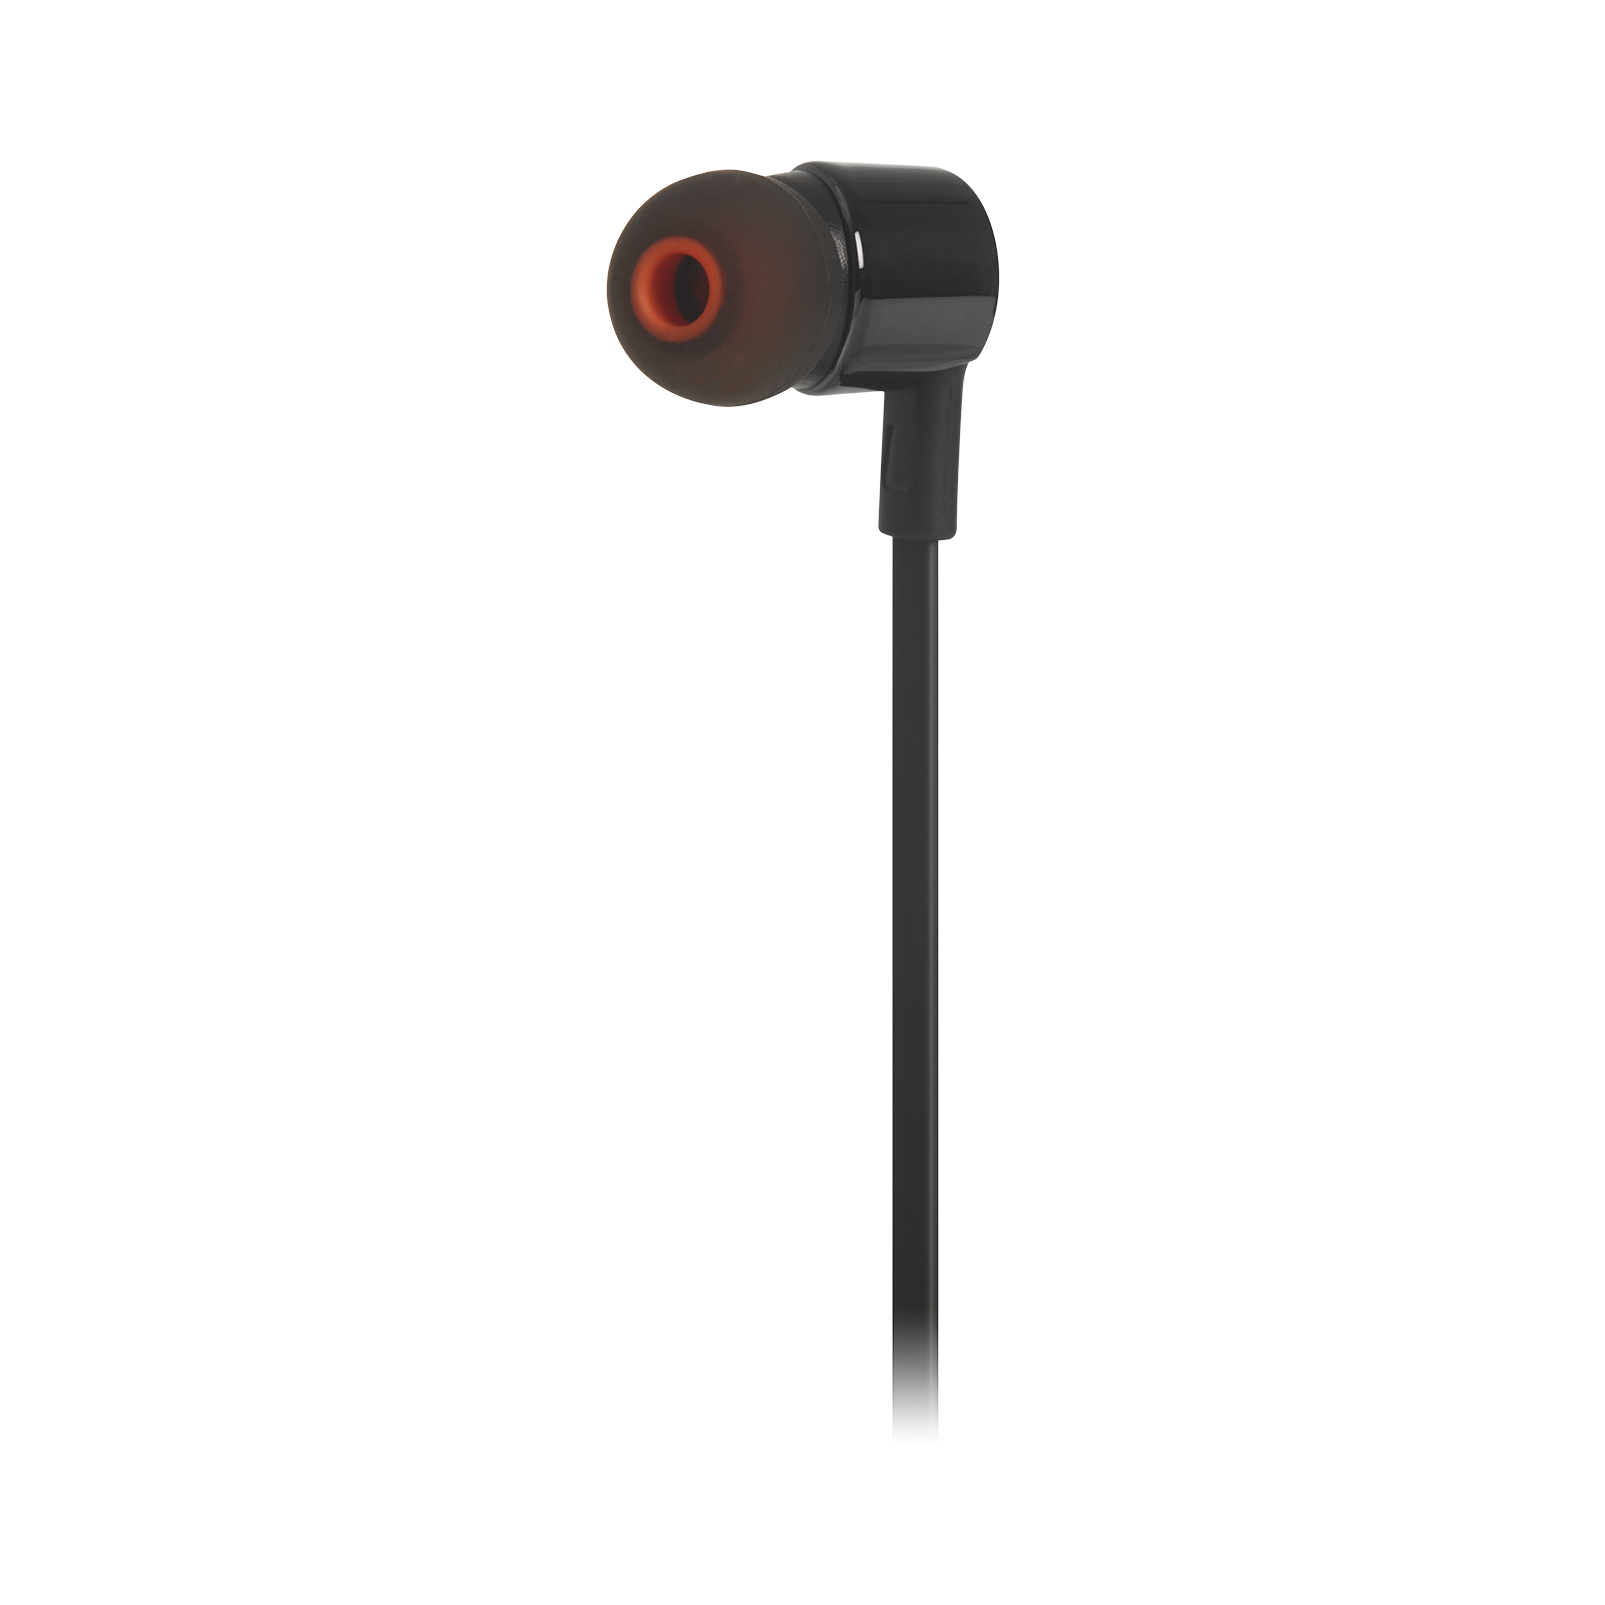 JBL TUNE 210 - Black - In-ear headphones - Detailshot 3